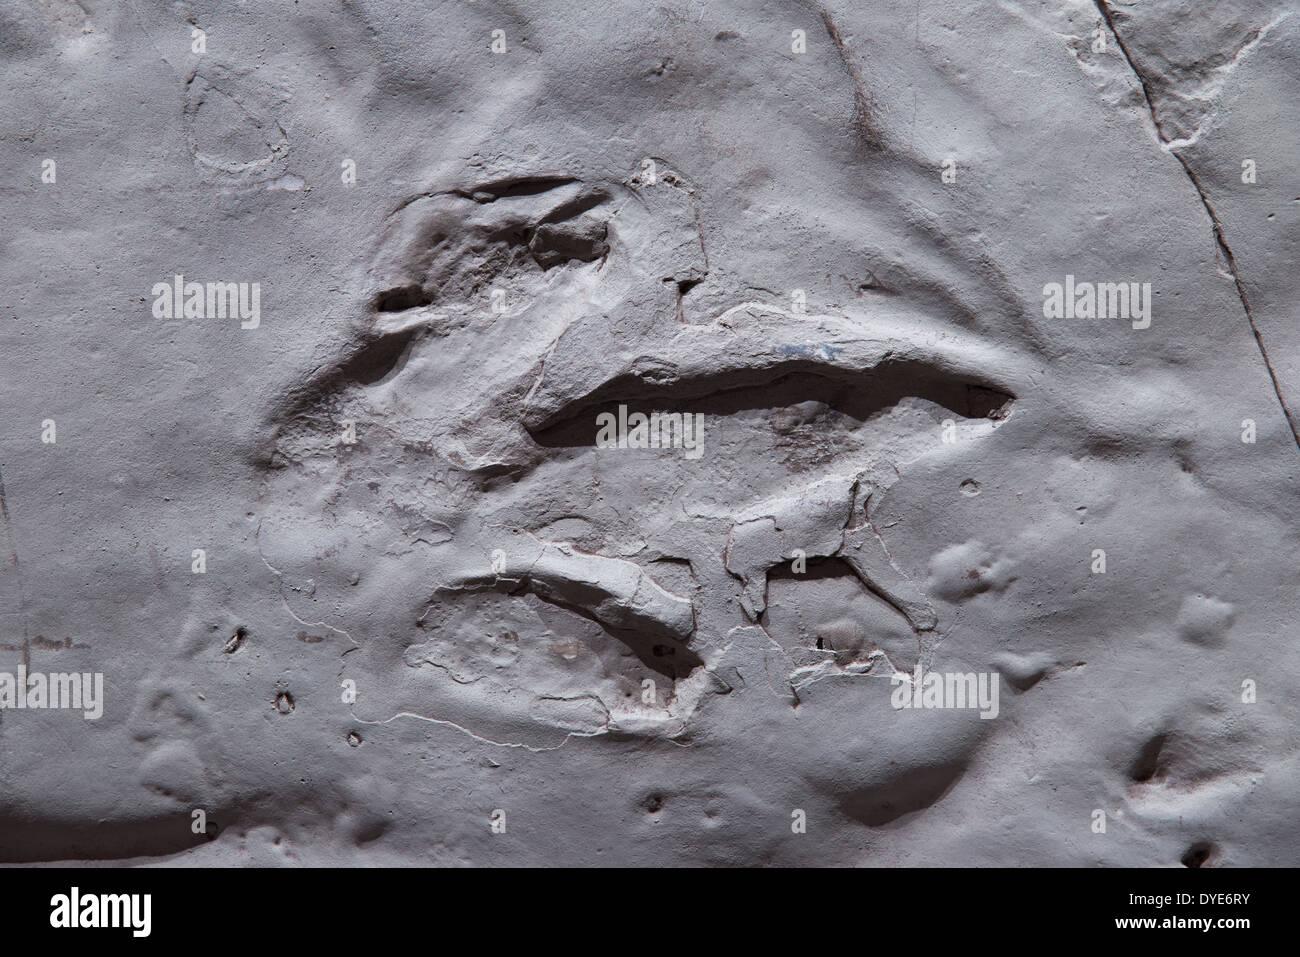 Dinosaur footprint left in a mud-rock. - Stock Image